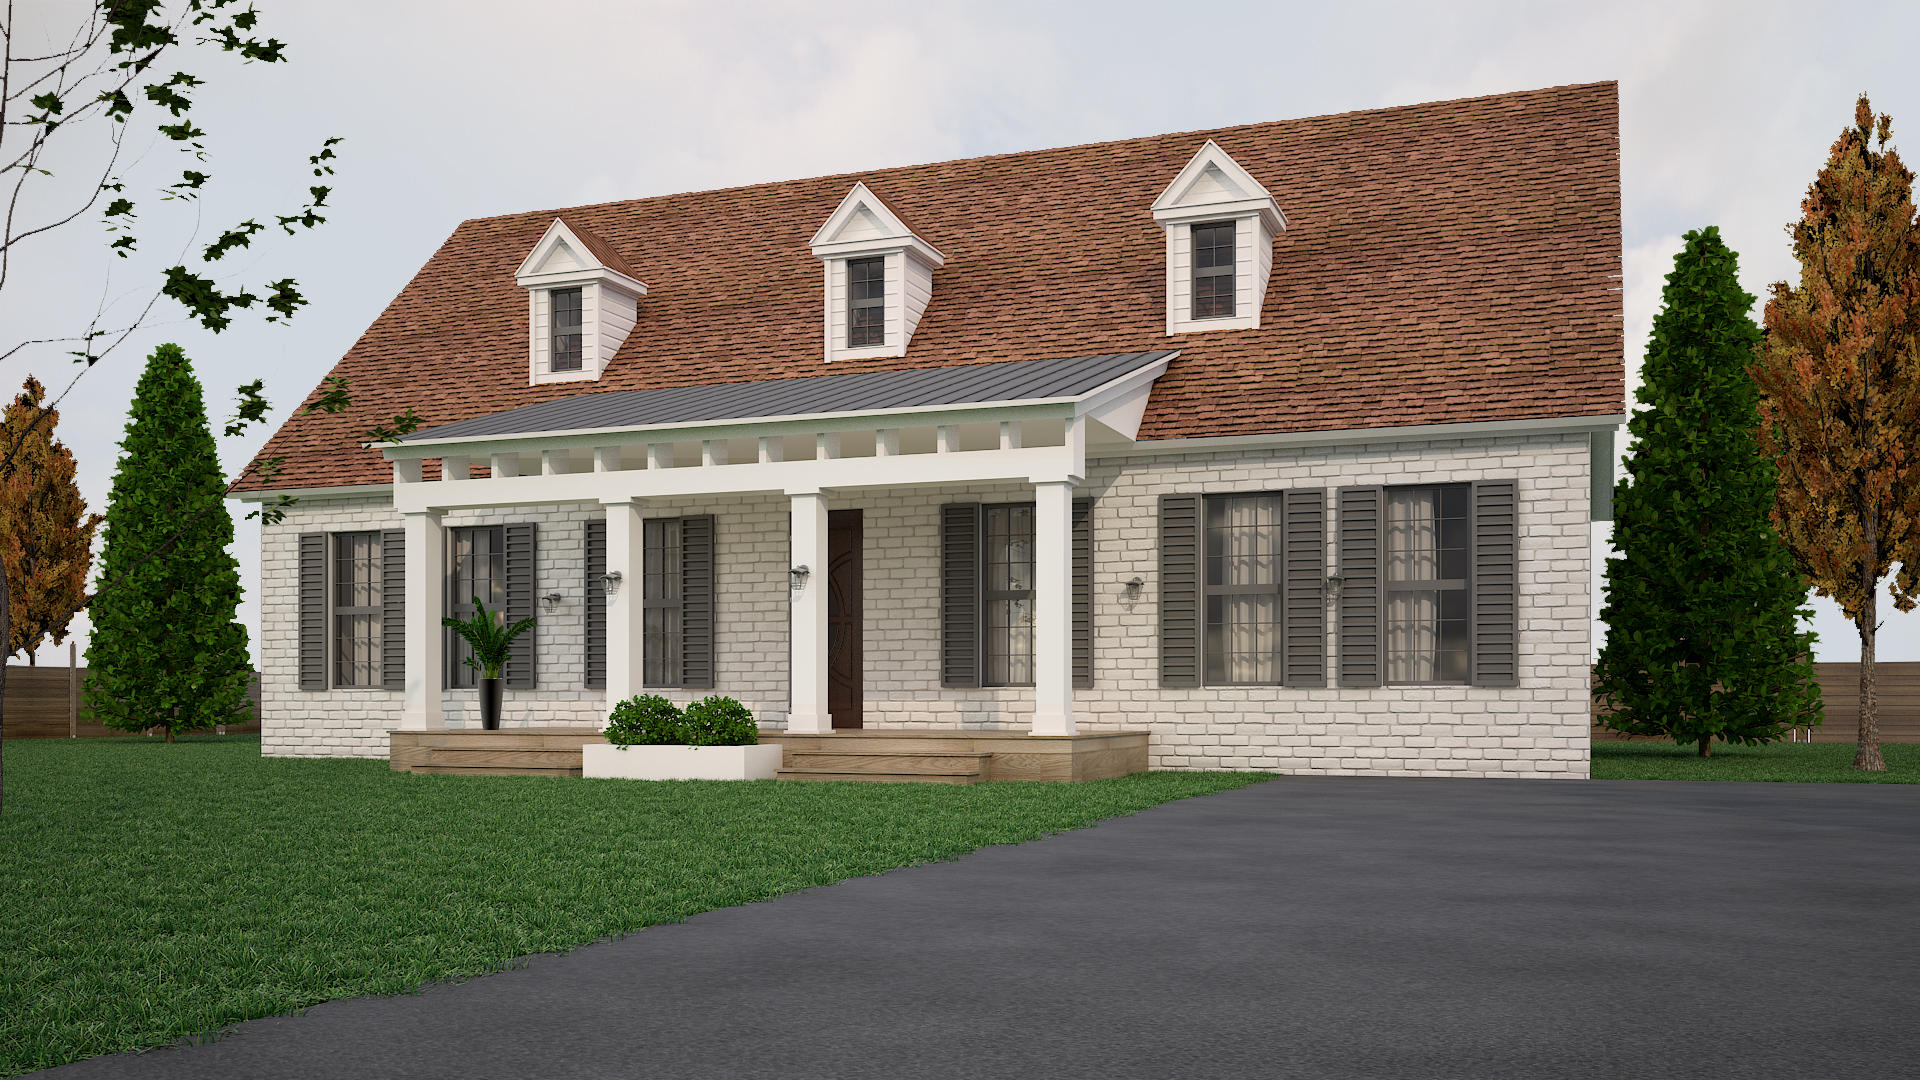 Old Mt Pleasant Homes For Sale - 1496 Goblet, Mount Pleasant, SC - 18